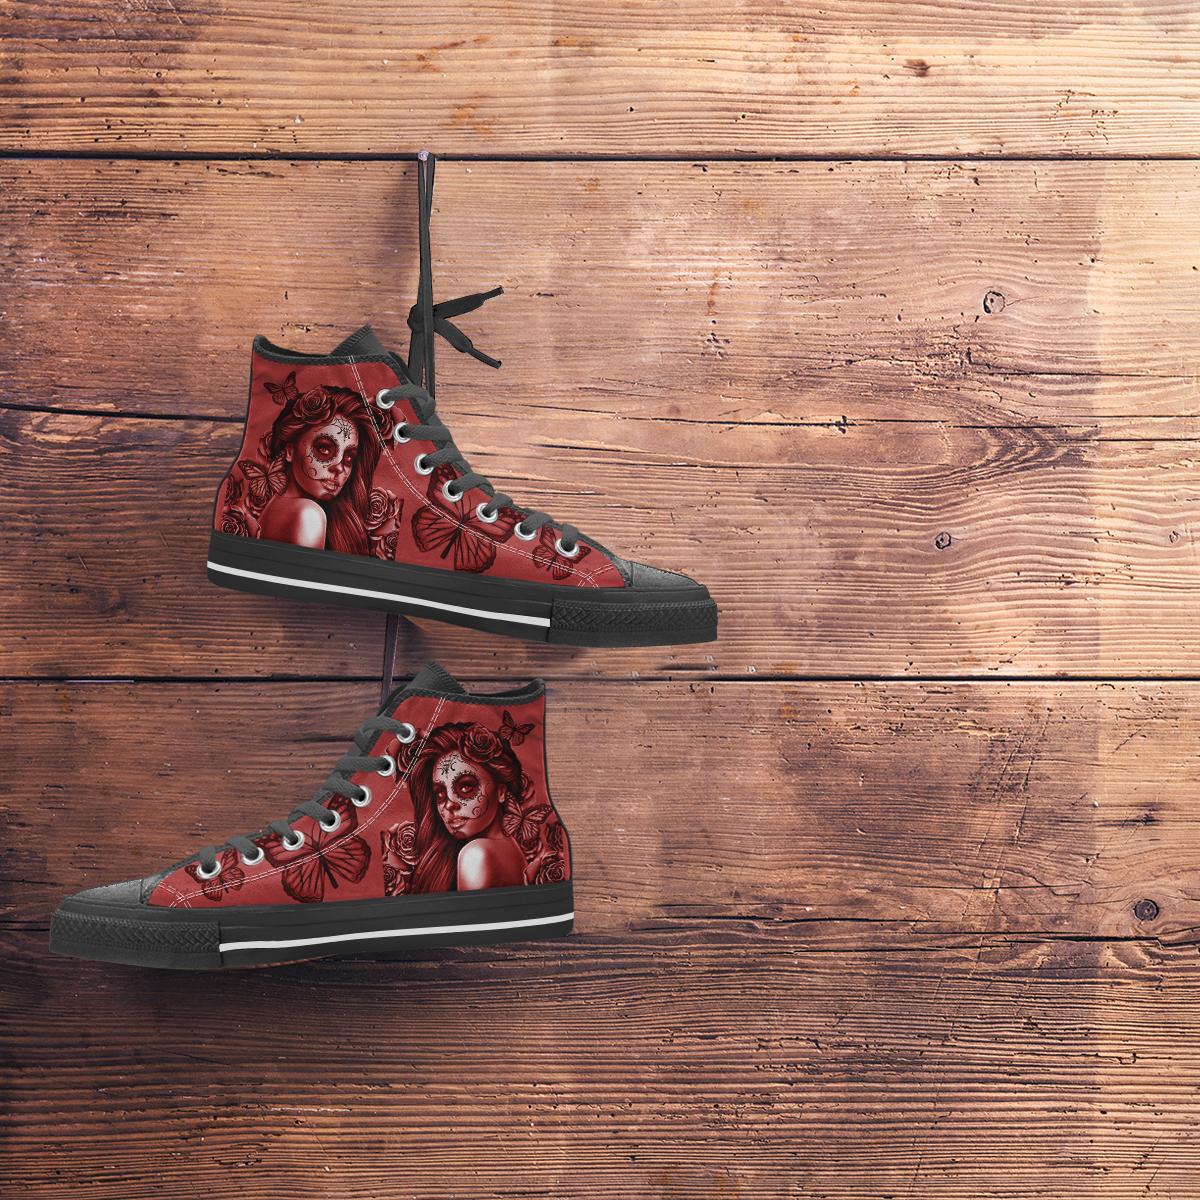 Red Freedom Rose  Black Soles Calavera Women/'s High Top Canvas Shoes Day Of The Dead  Dia De Los Muertos  Halloween Skull Design #2